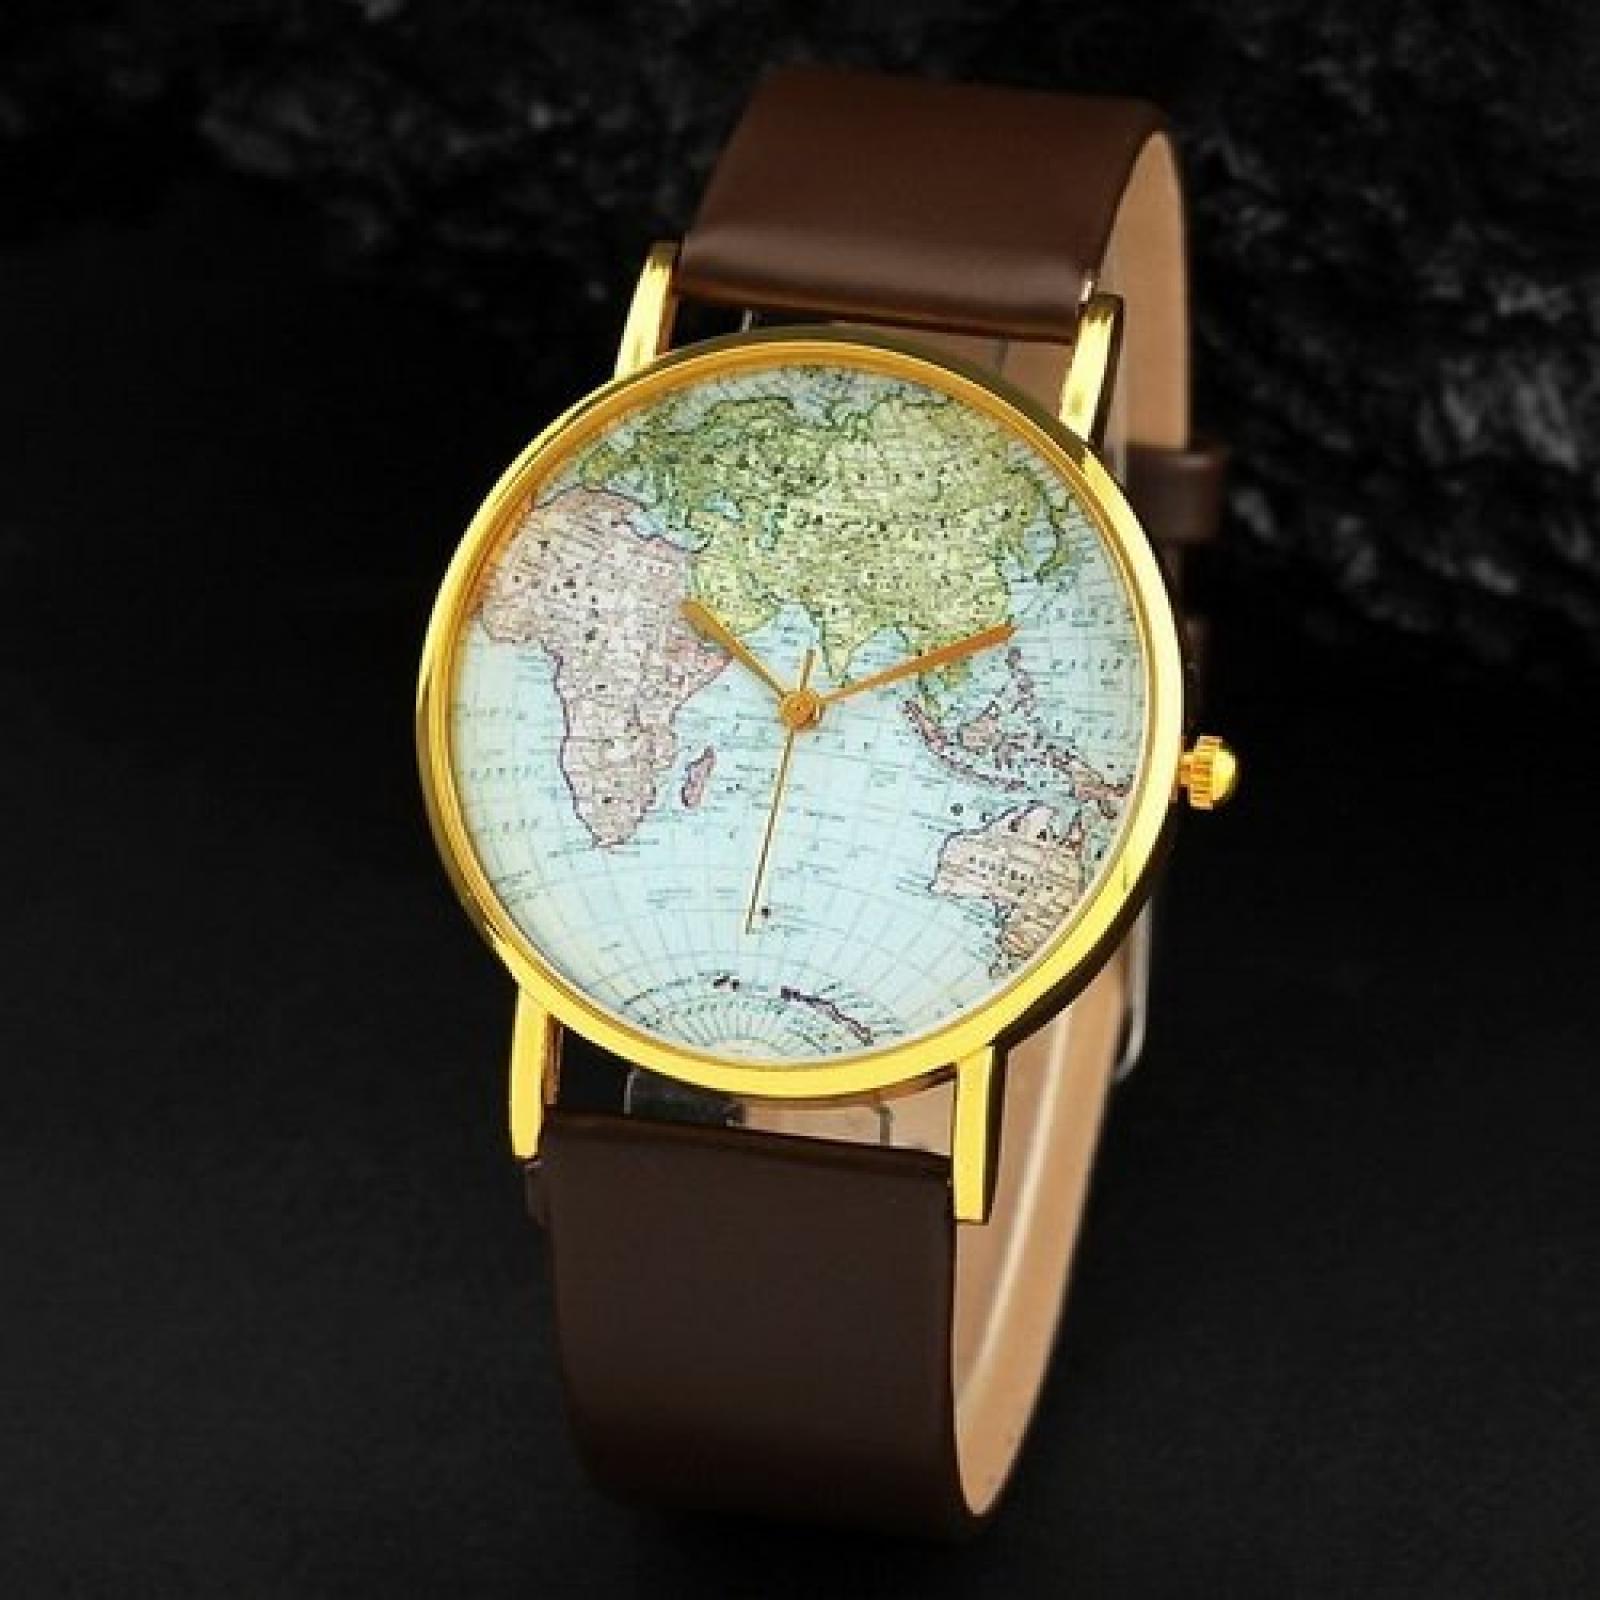 Retro Weltkarte Uhr Lederausstattung Leichtmetall Damen Analoge Quarz Armbanduhr Braun